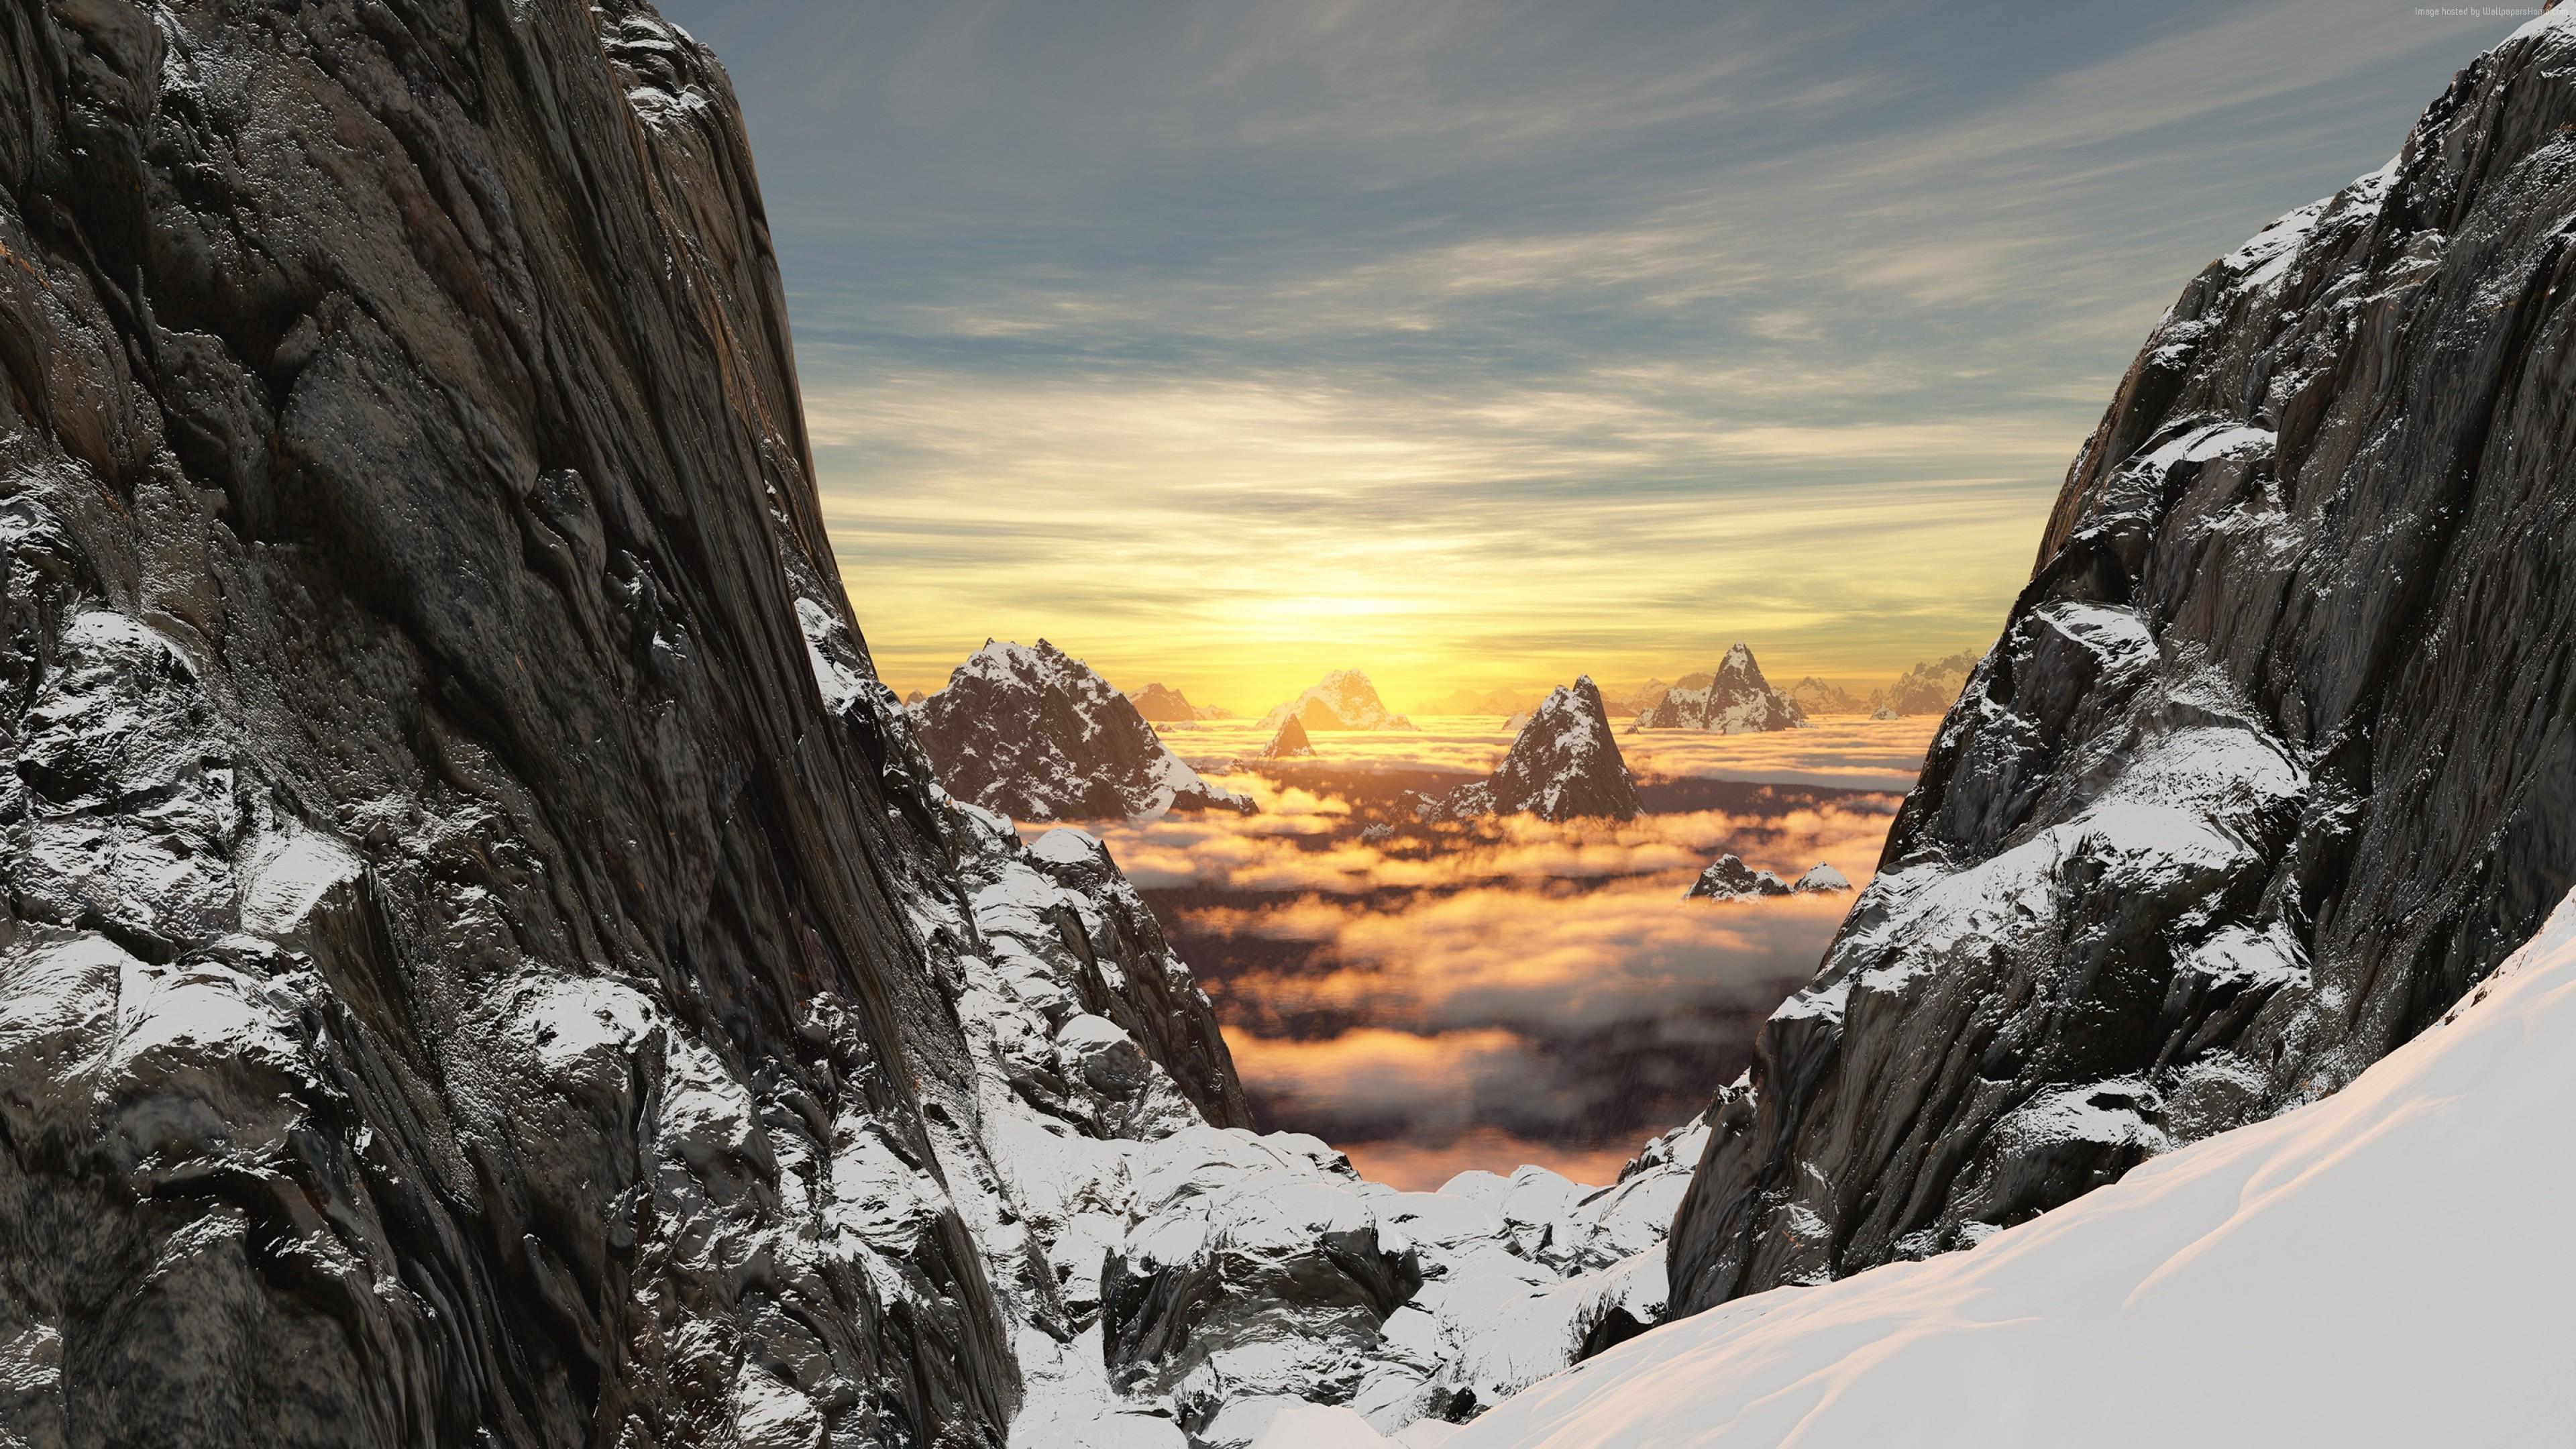 Wallpaper Mountain Snow Rock High Altitude 4k Nature Wallpaper Download High Resolution 4k Wallpaper